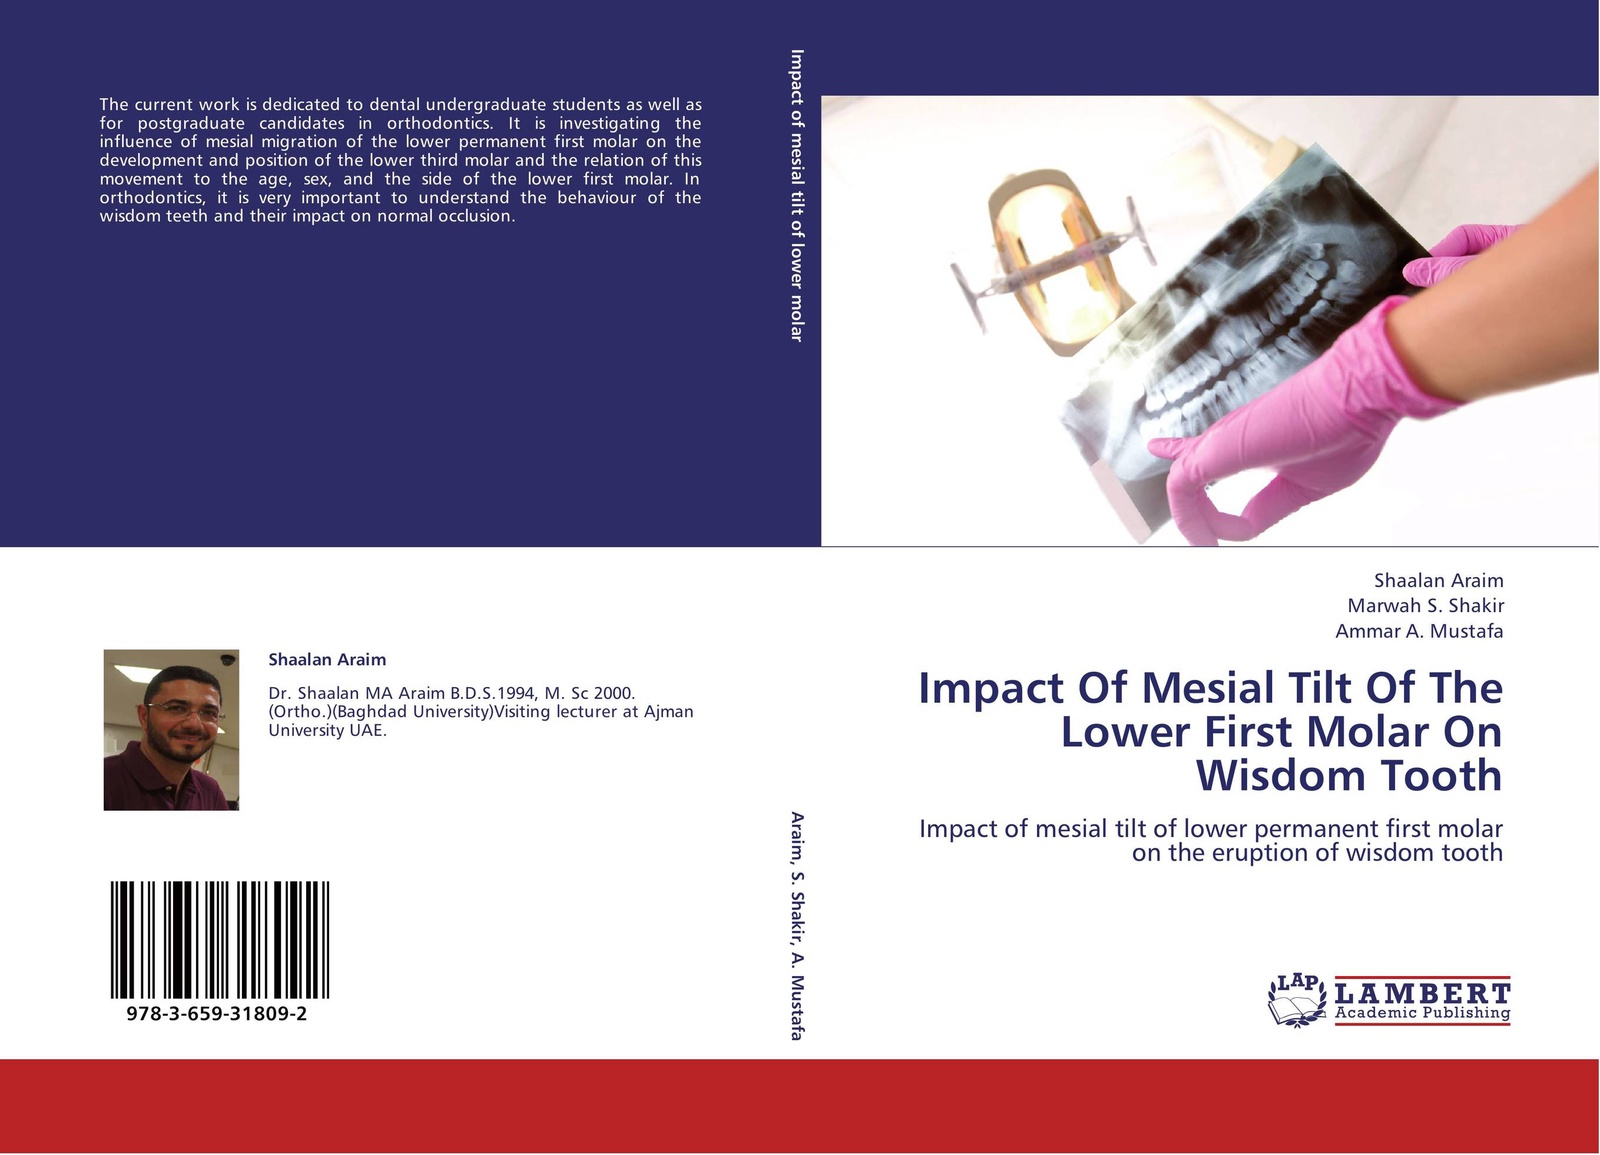 Shaalan Araim,Marwah S. Shakir and Ammar A. Mustafa Impact Of Mesial Tilt Of The Lower First Molar On Wisdom Tooth